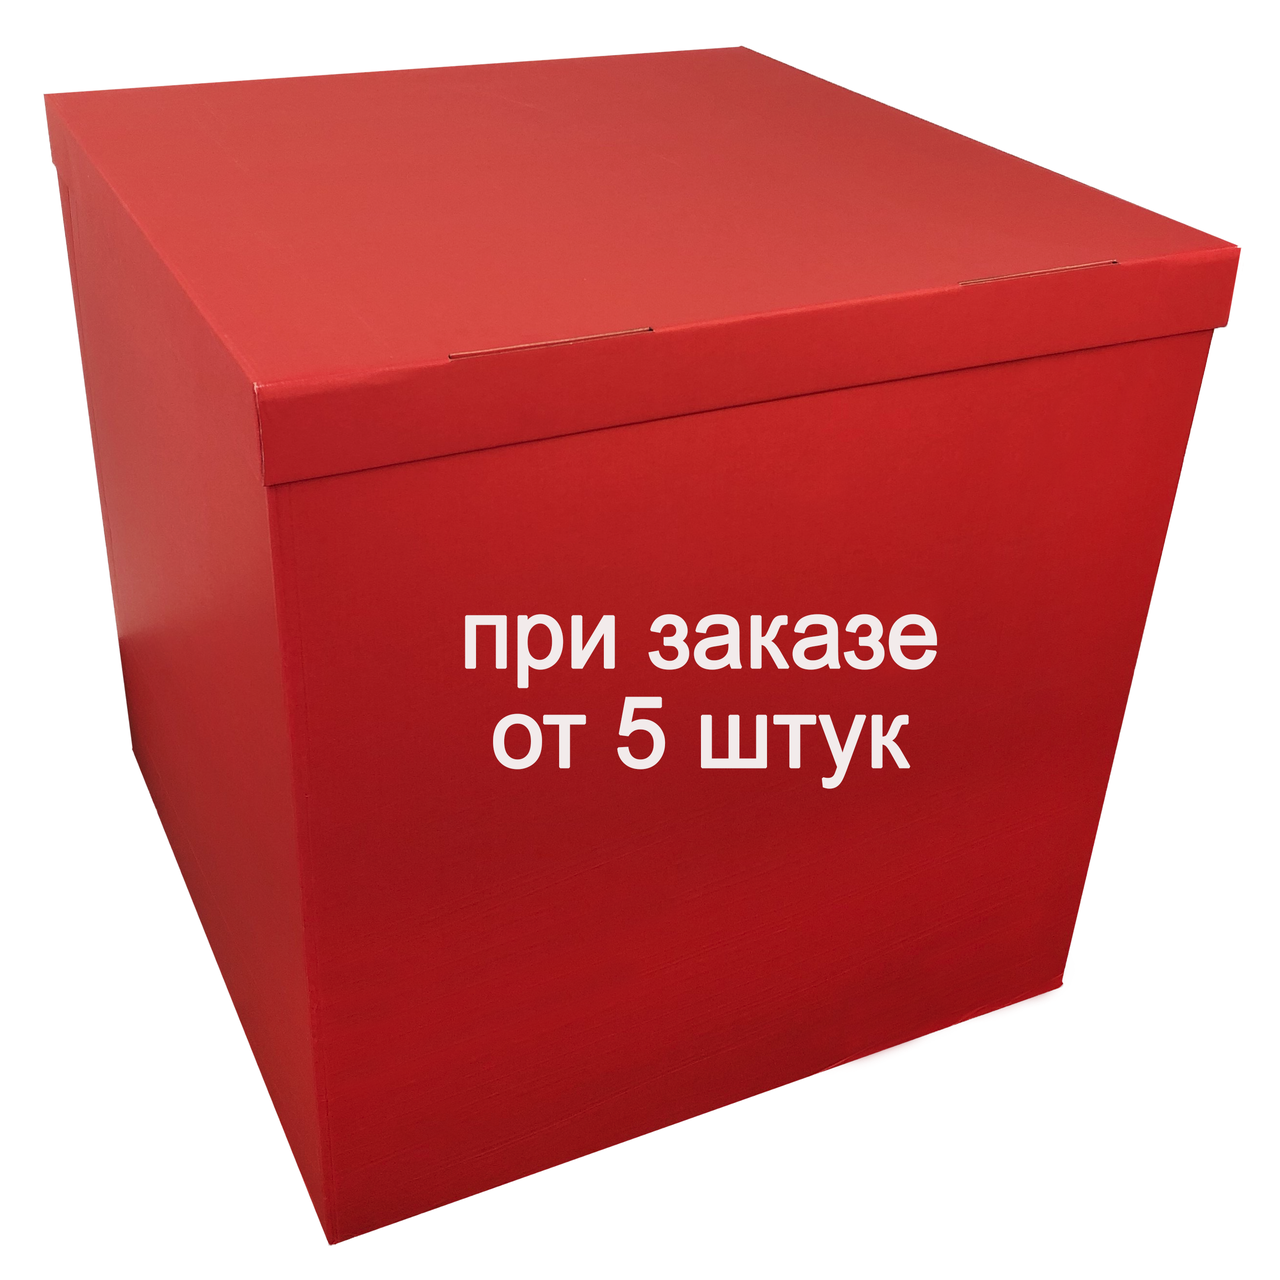 Коробка-сюрприз 70*70*70см двухсторонняя красная